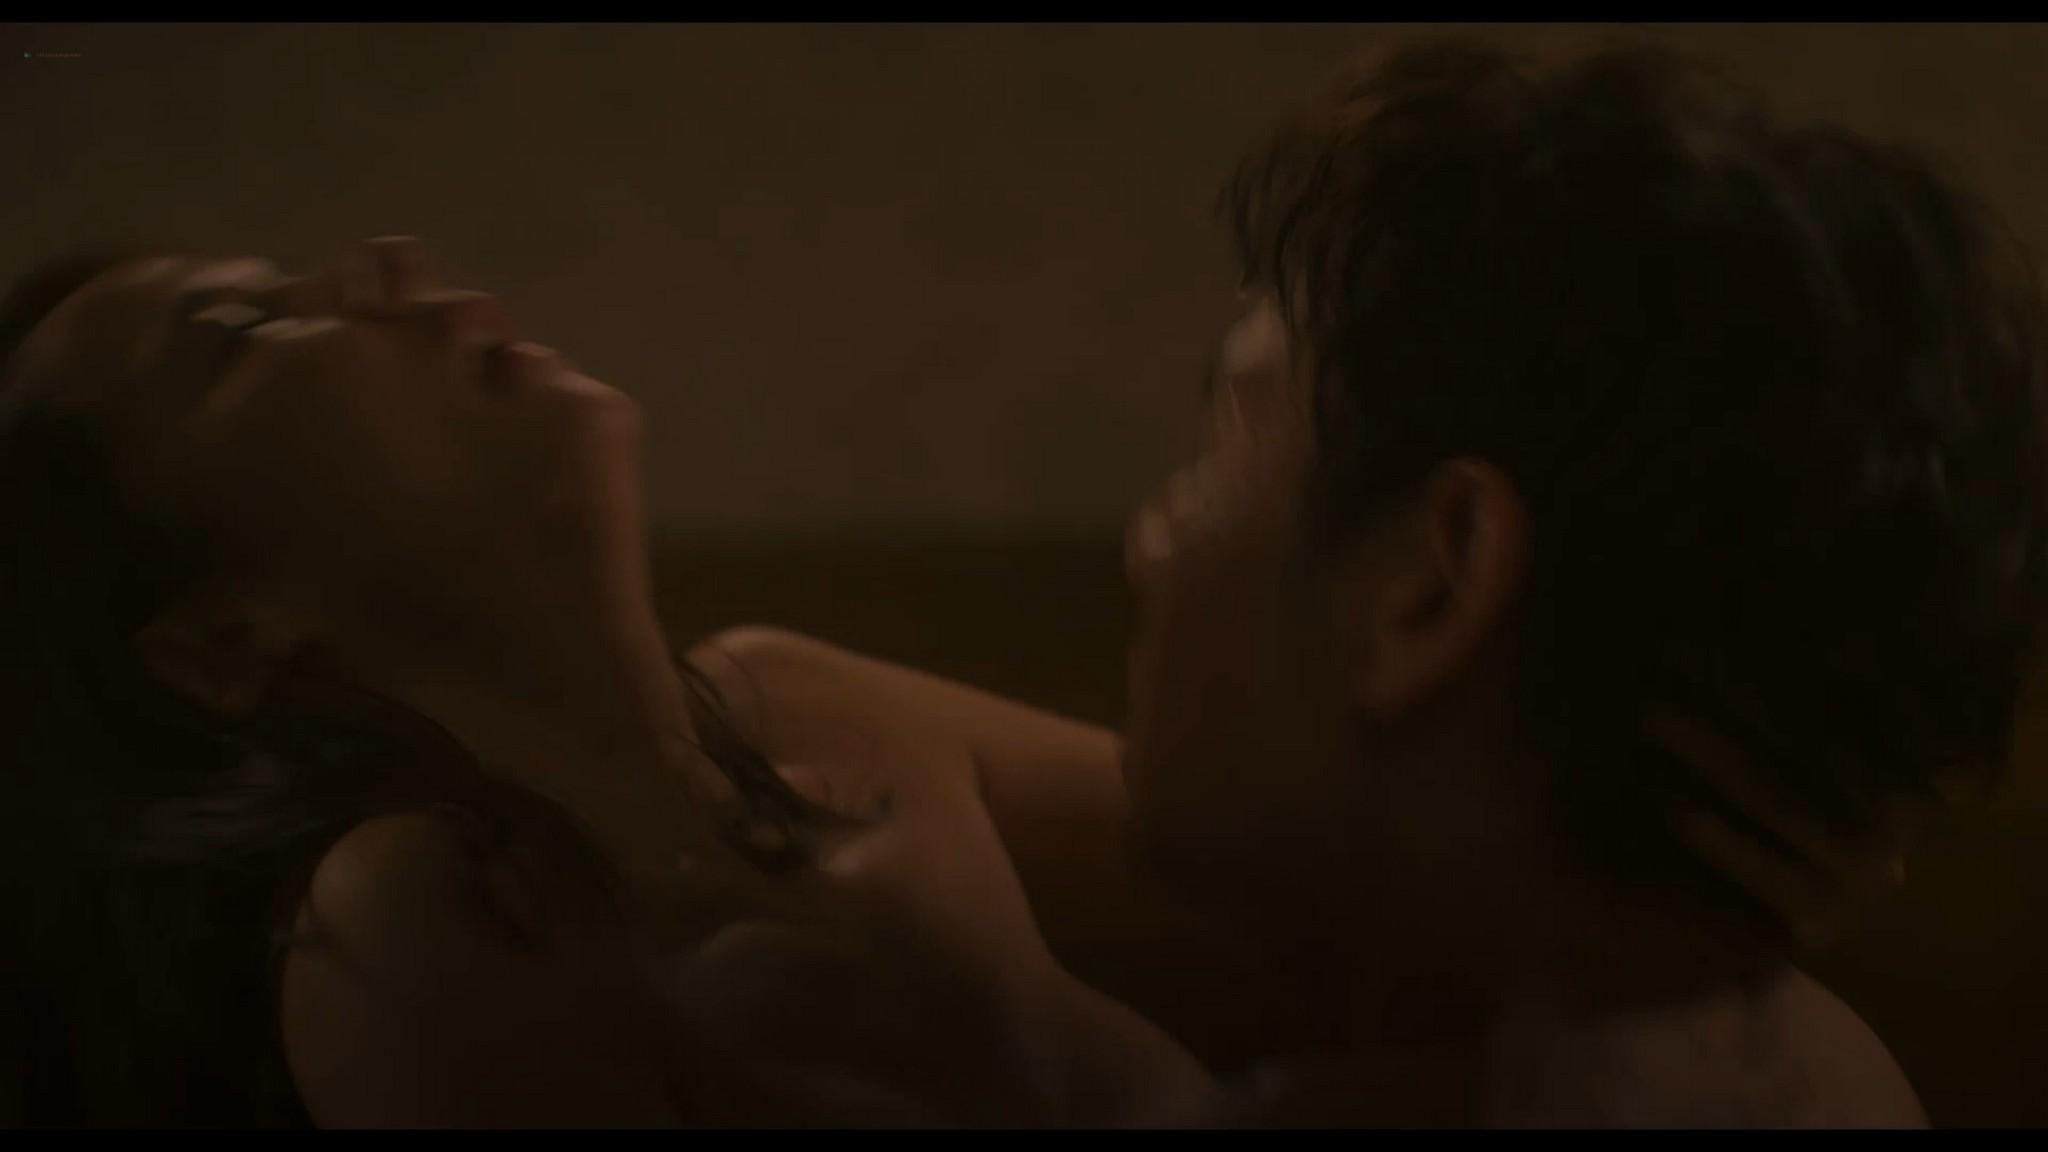 Yeo jeong Cho nude Clara Lee sexy Casa Amor Exclusive for Ladies 2015 1080p BluRay 6